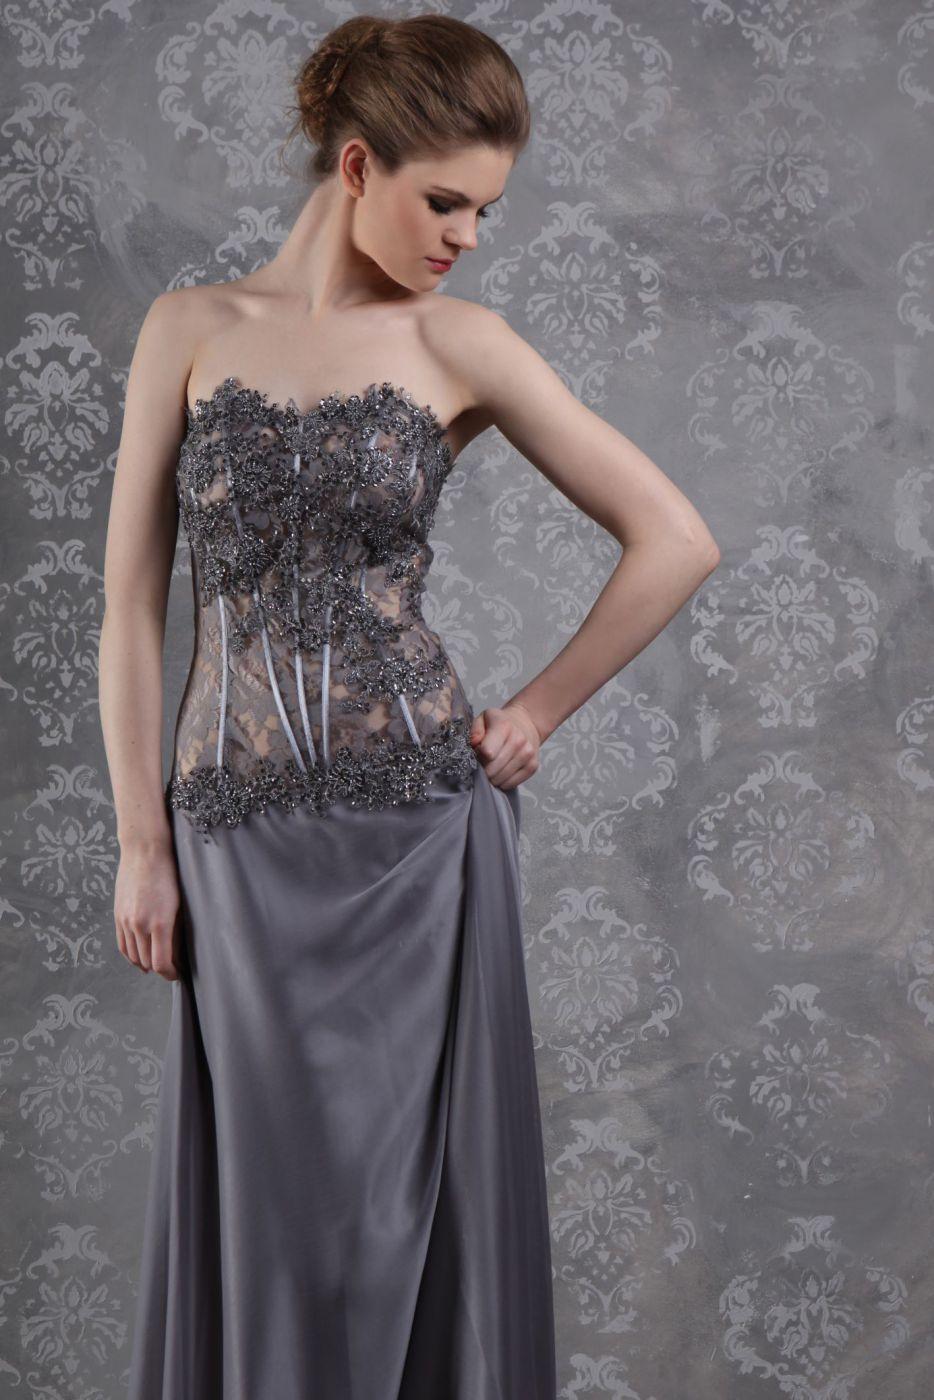 langes abendkleid ballkleid silber grau - kleiderfreuden